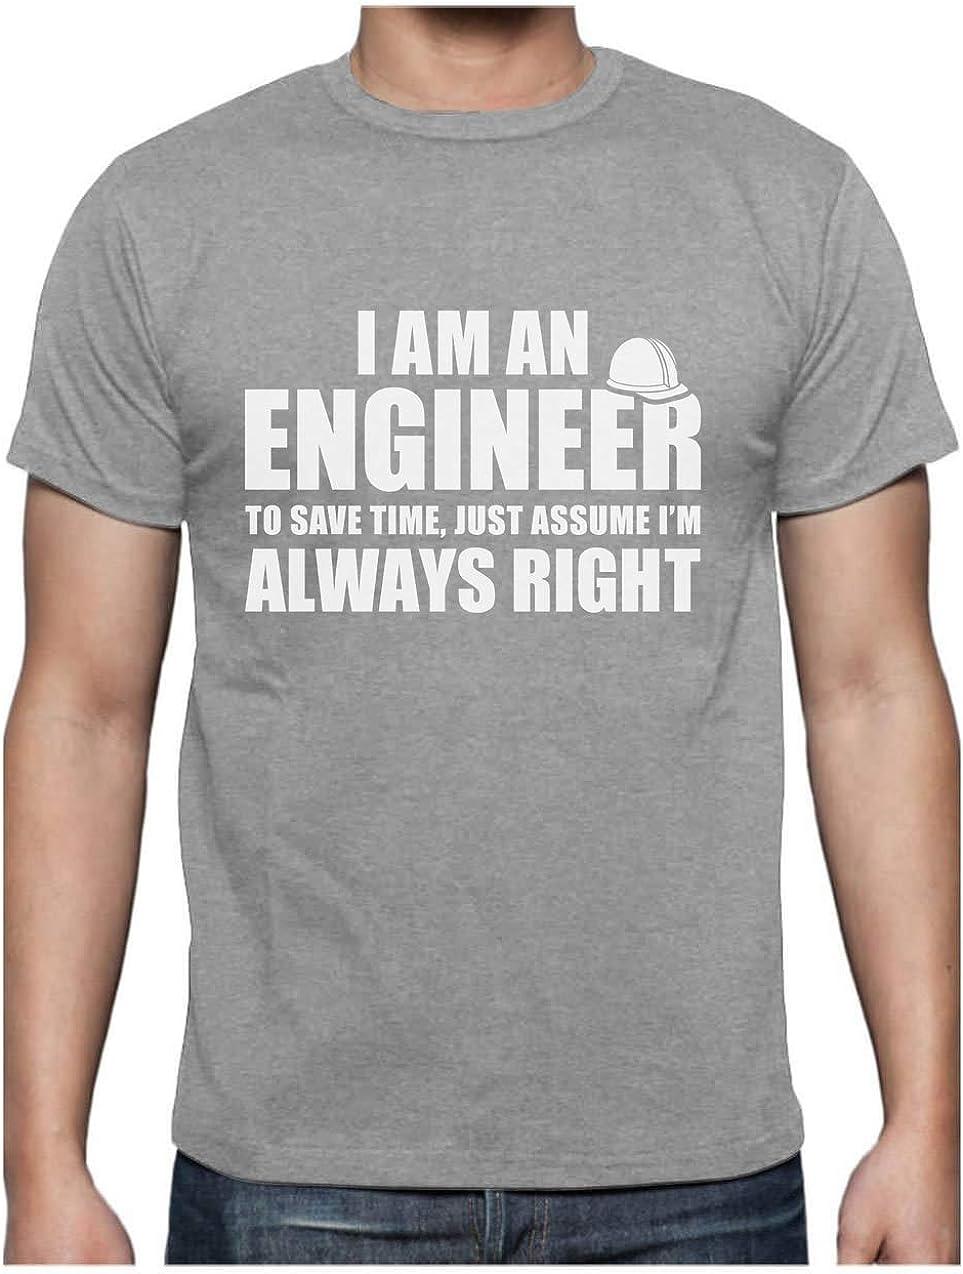 Green Turtle T-Shirts Camiseta para Hombre - Regalo para Ingeniero - I'm an Engineer, I'm Always Right